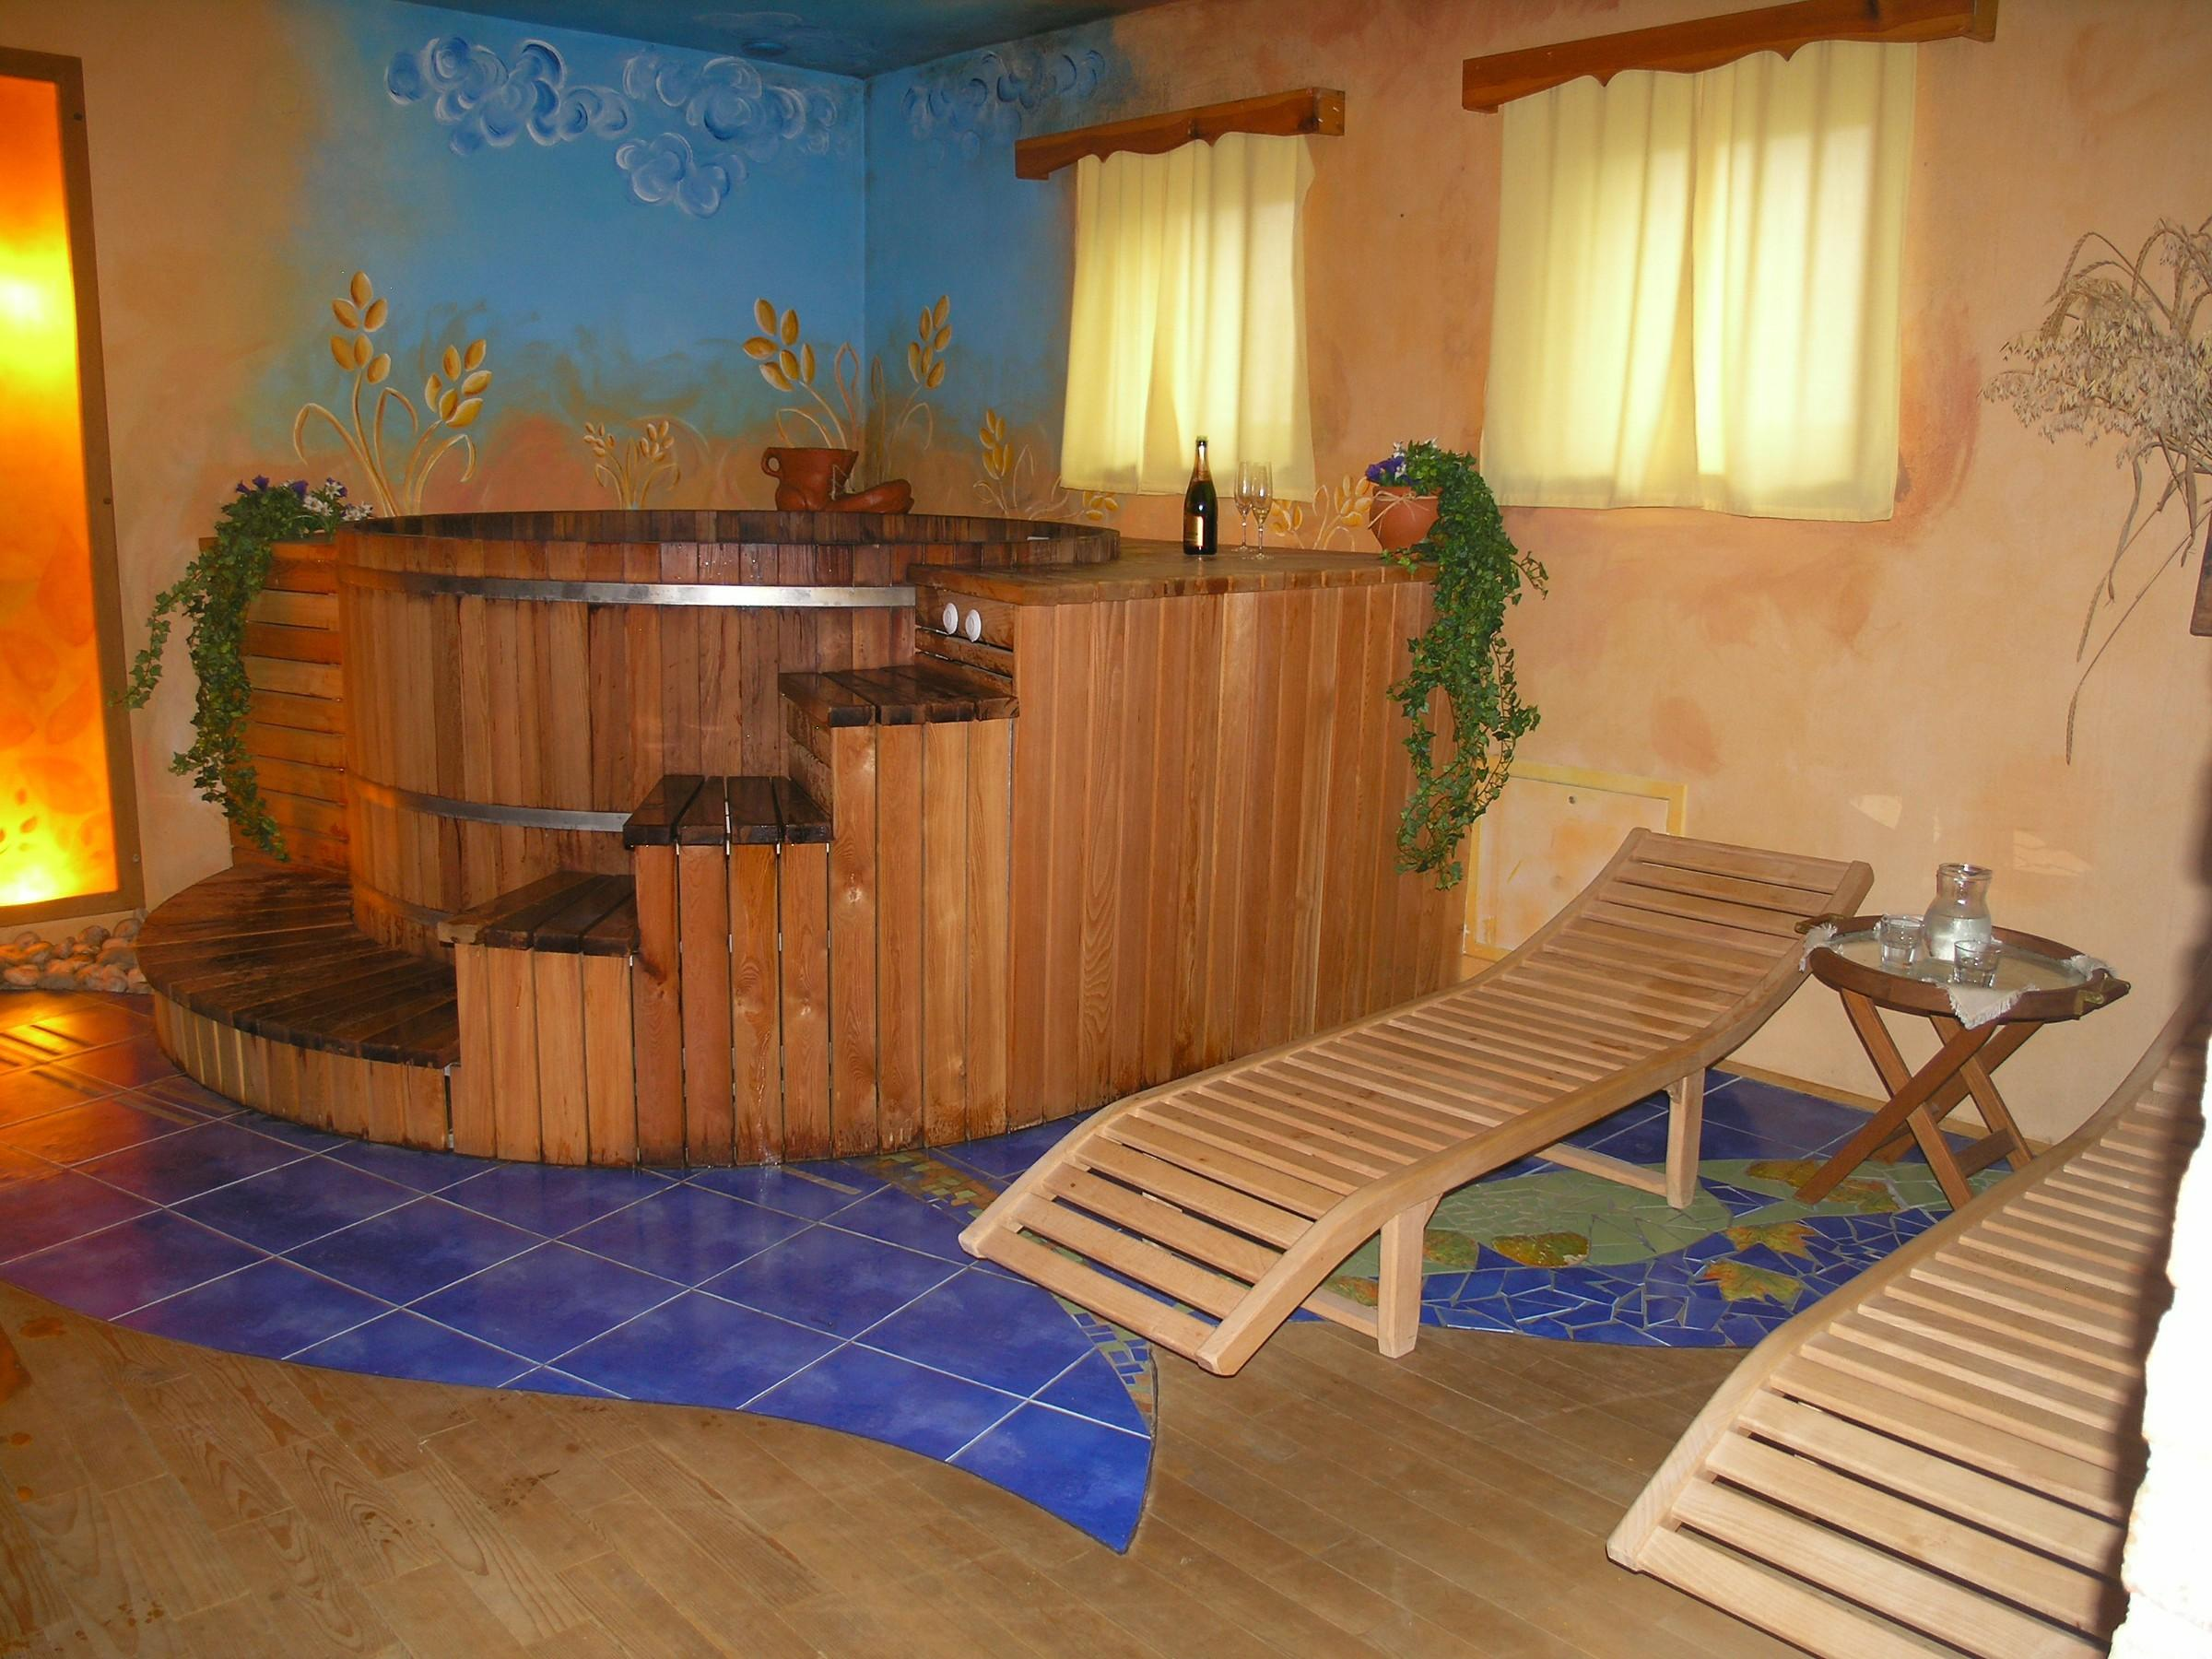 FormatFactoryBrineƒev mlin- Welness, foto arhiv Brineƒev mlin, Savinjska dolina